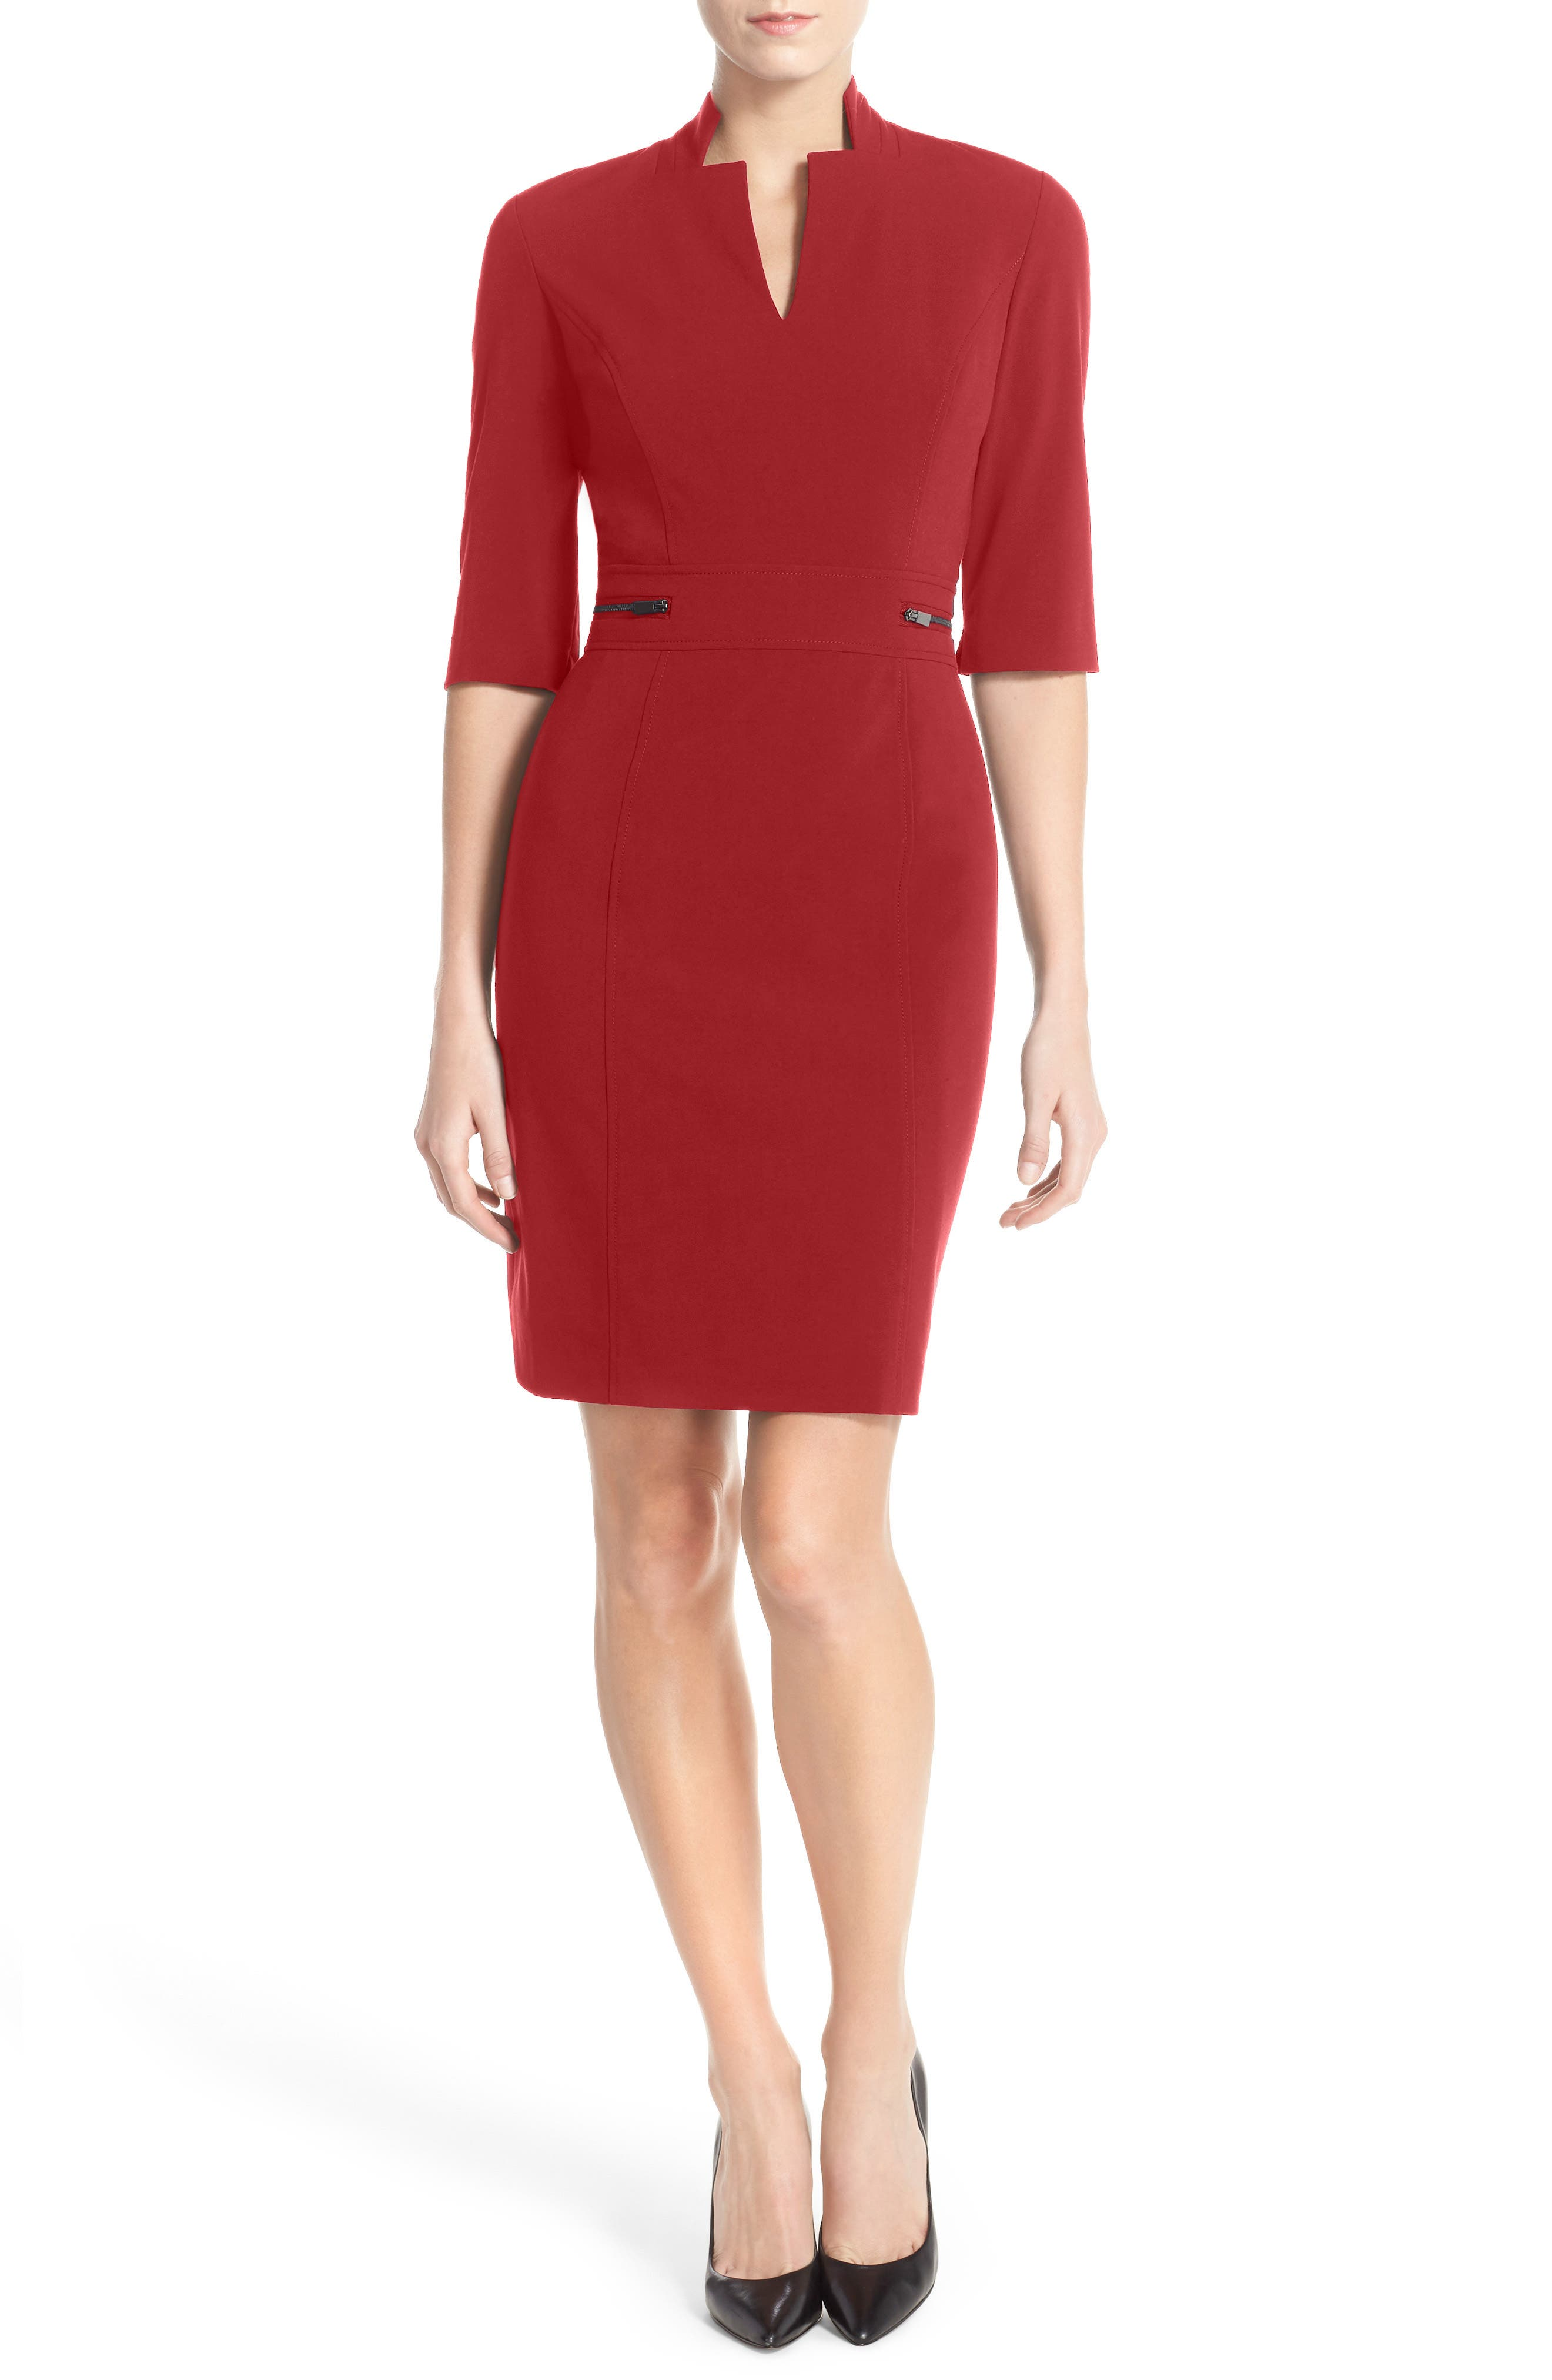 Red stretch lace sheath dress